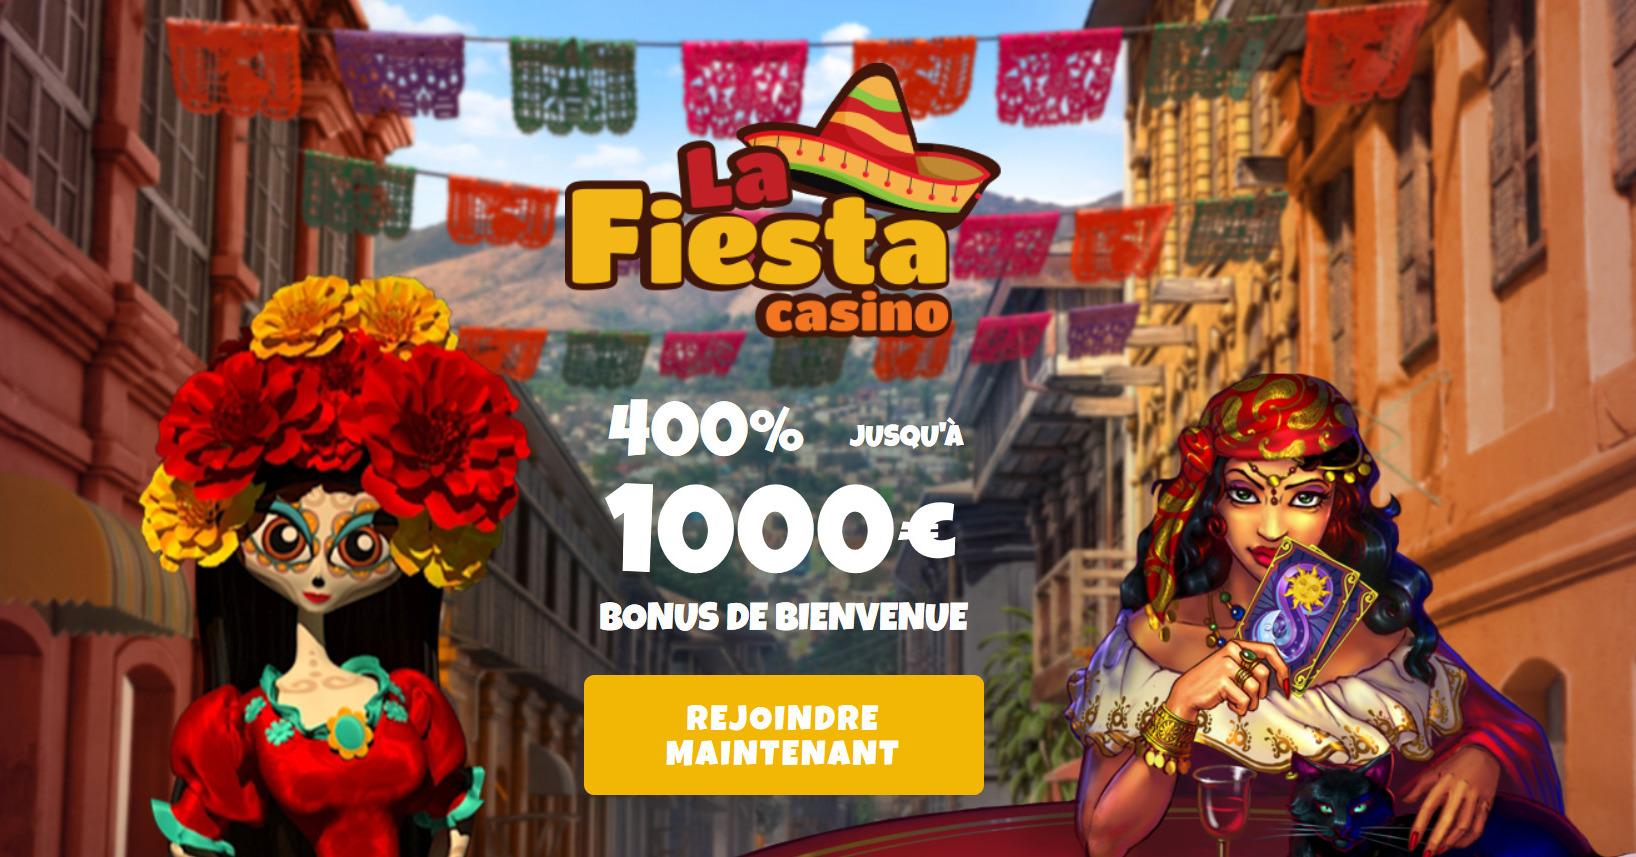 Casino La Fiesta : l'avis de notre équipe